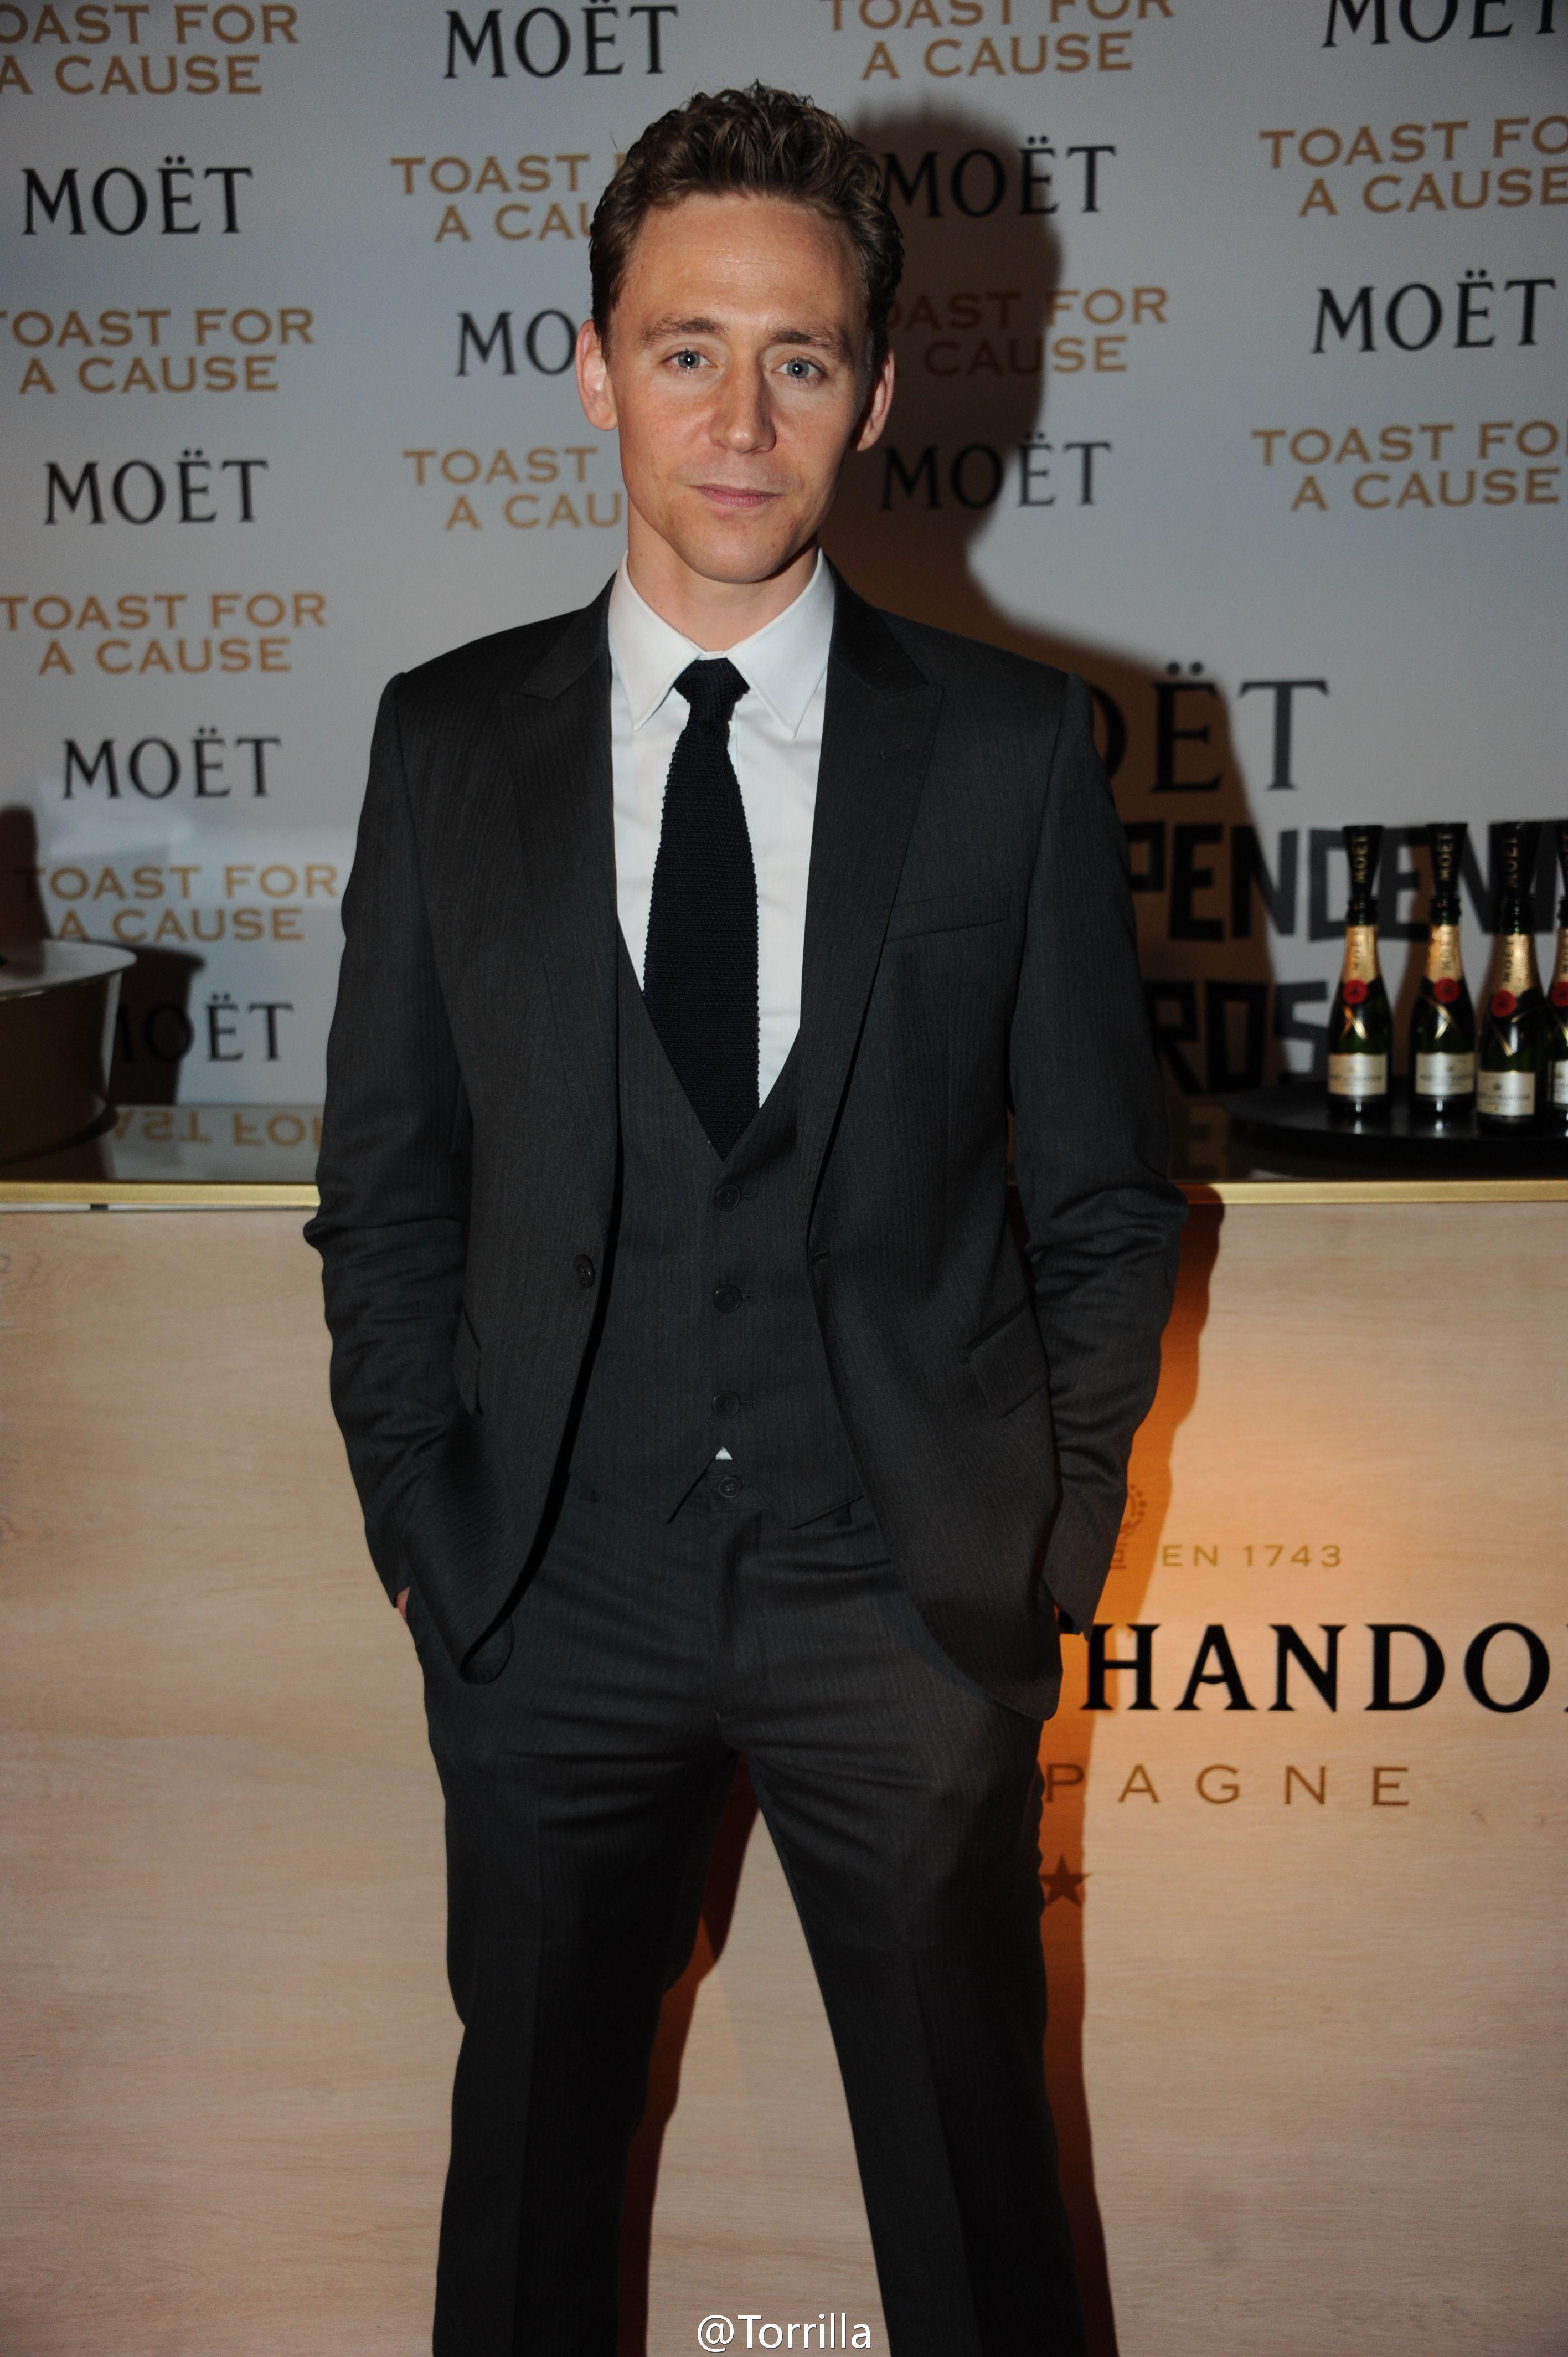 Tom Hiddleston. #MBIFA 2012